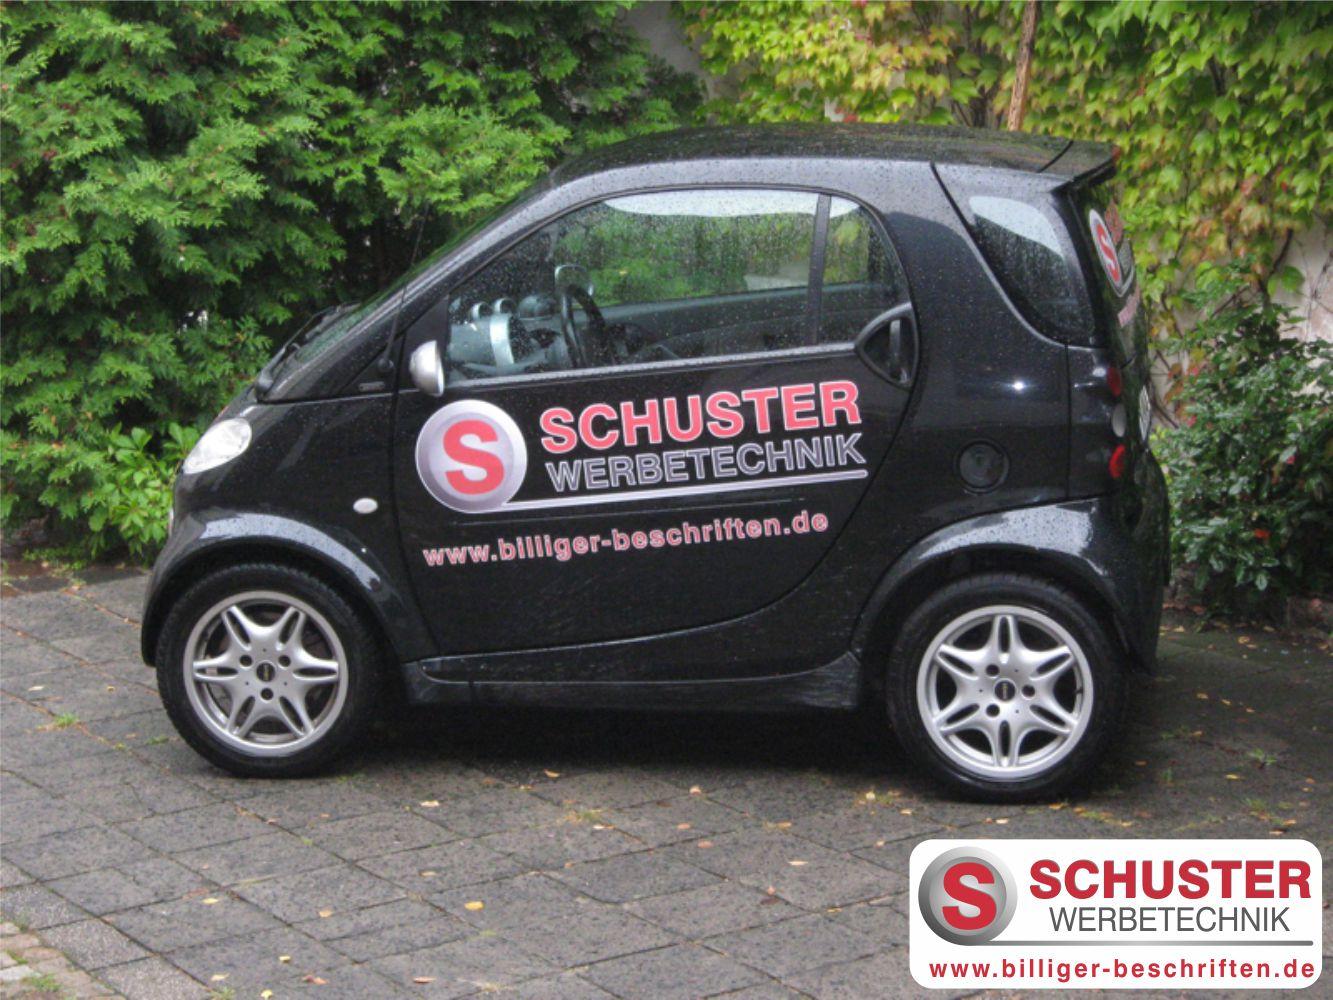 autobeschriftung-autobeklebung-auto-fahrzeug-werbung-beschriftet ...